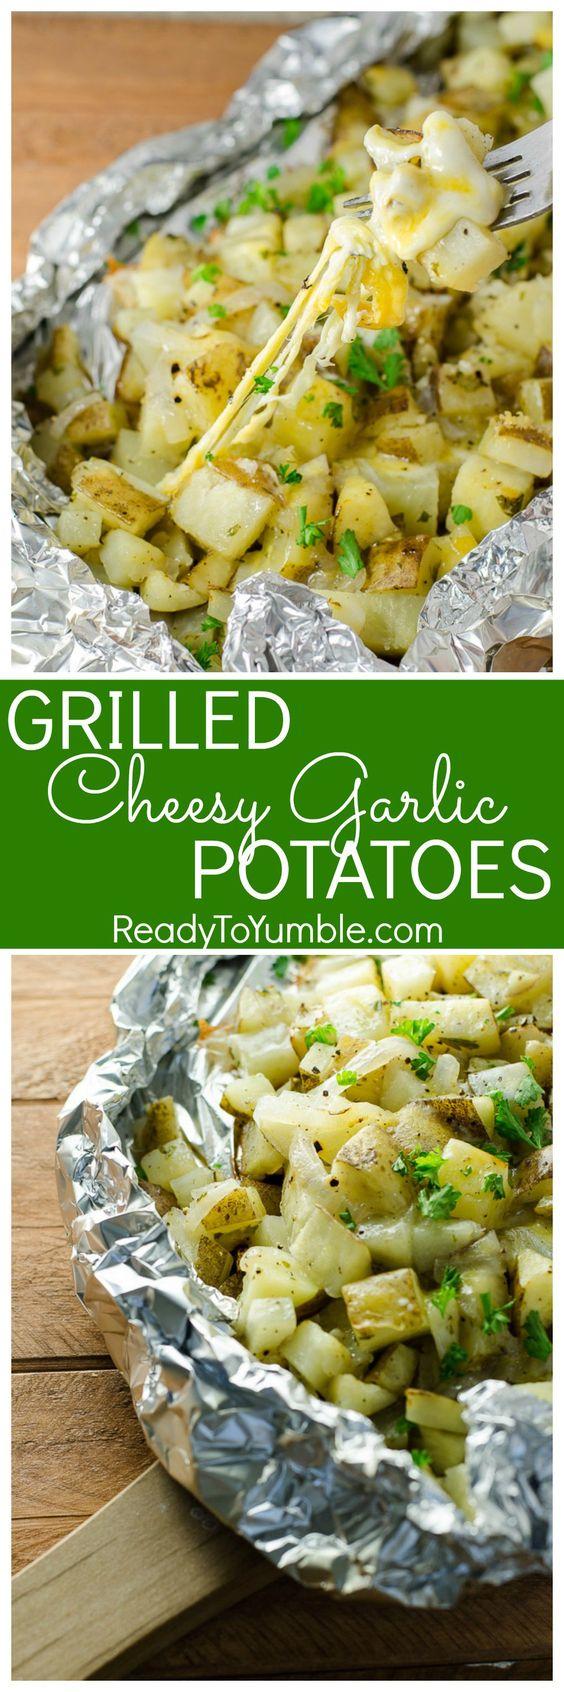 Grilled Cheesy Garlic Potatoes by ReadyToYumble.com